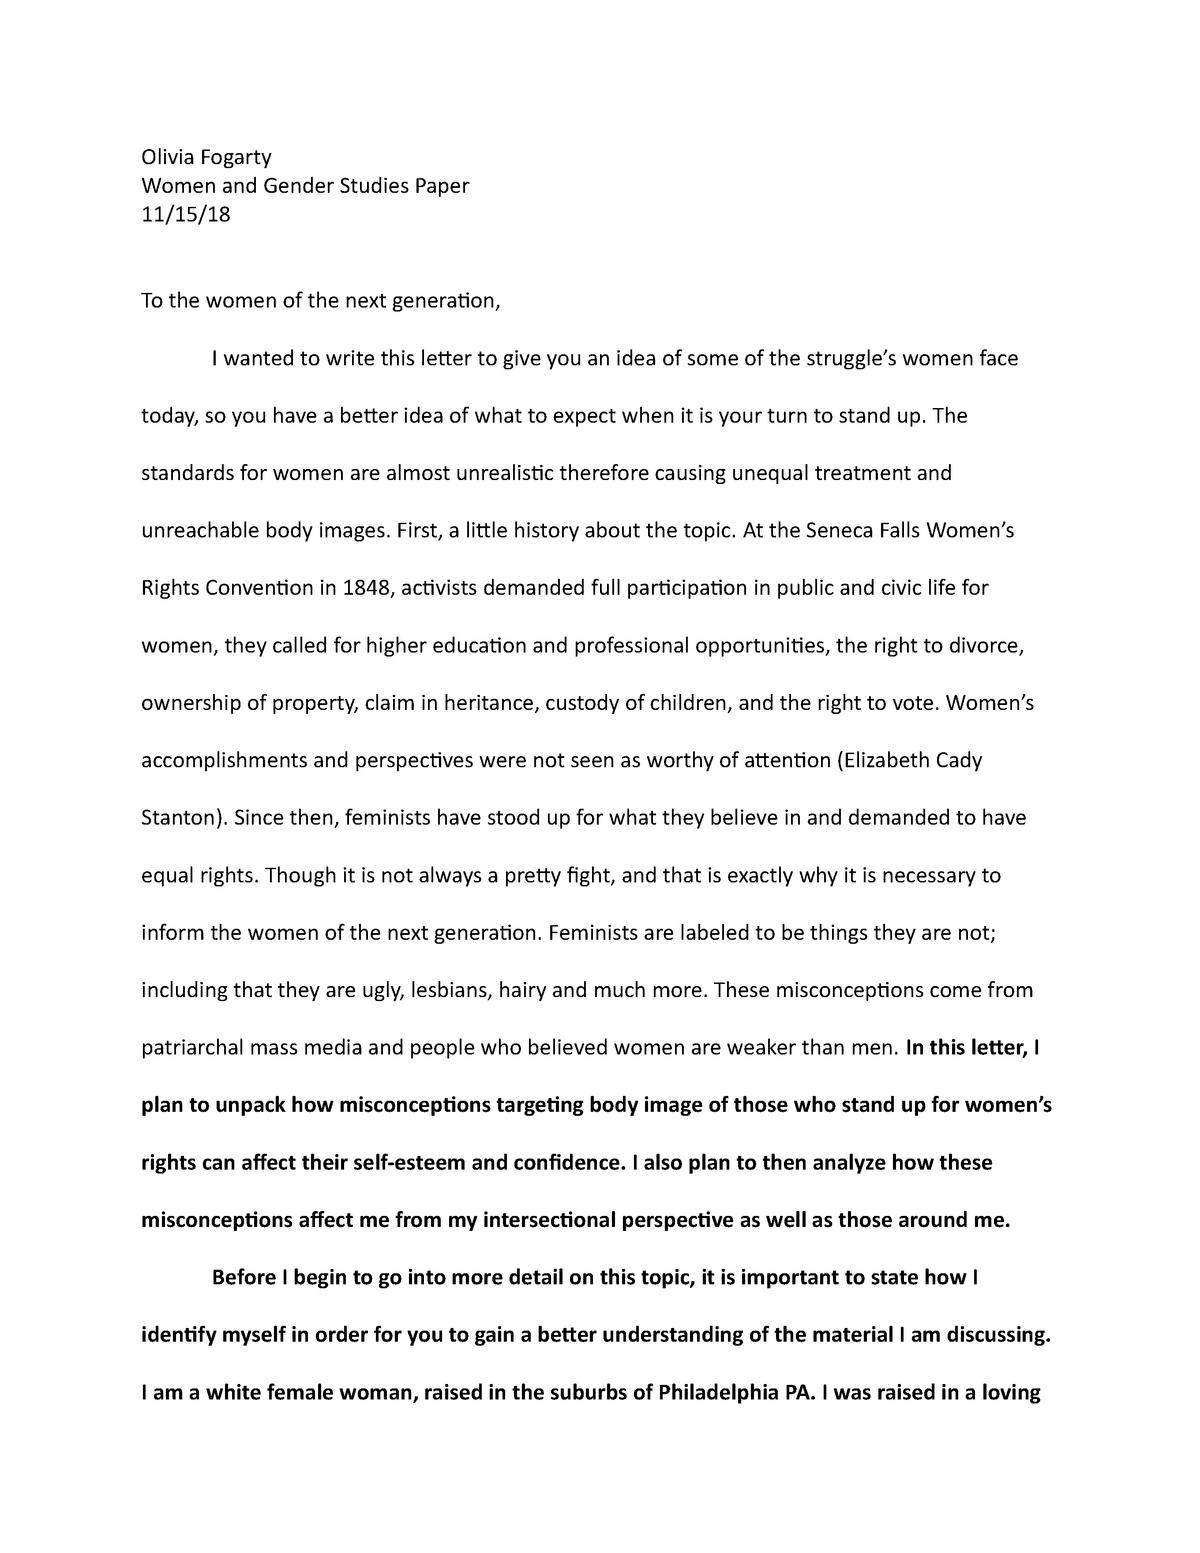 Women and gender studies essay ghostwriting website summer vacations essay